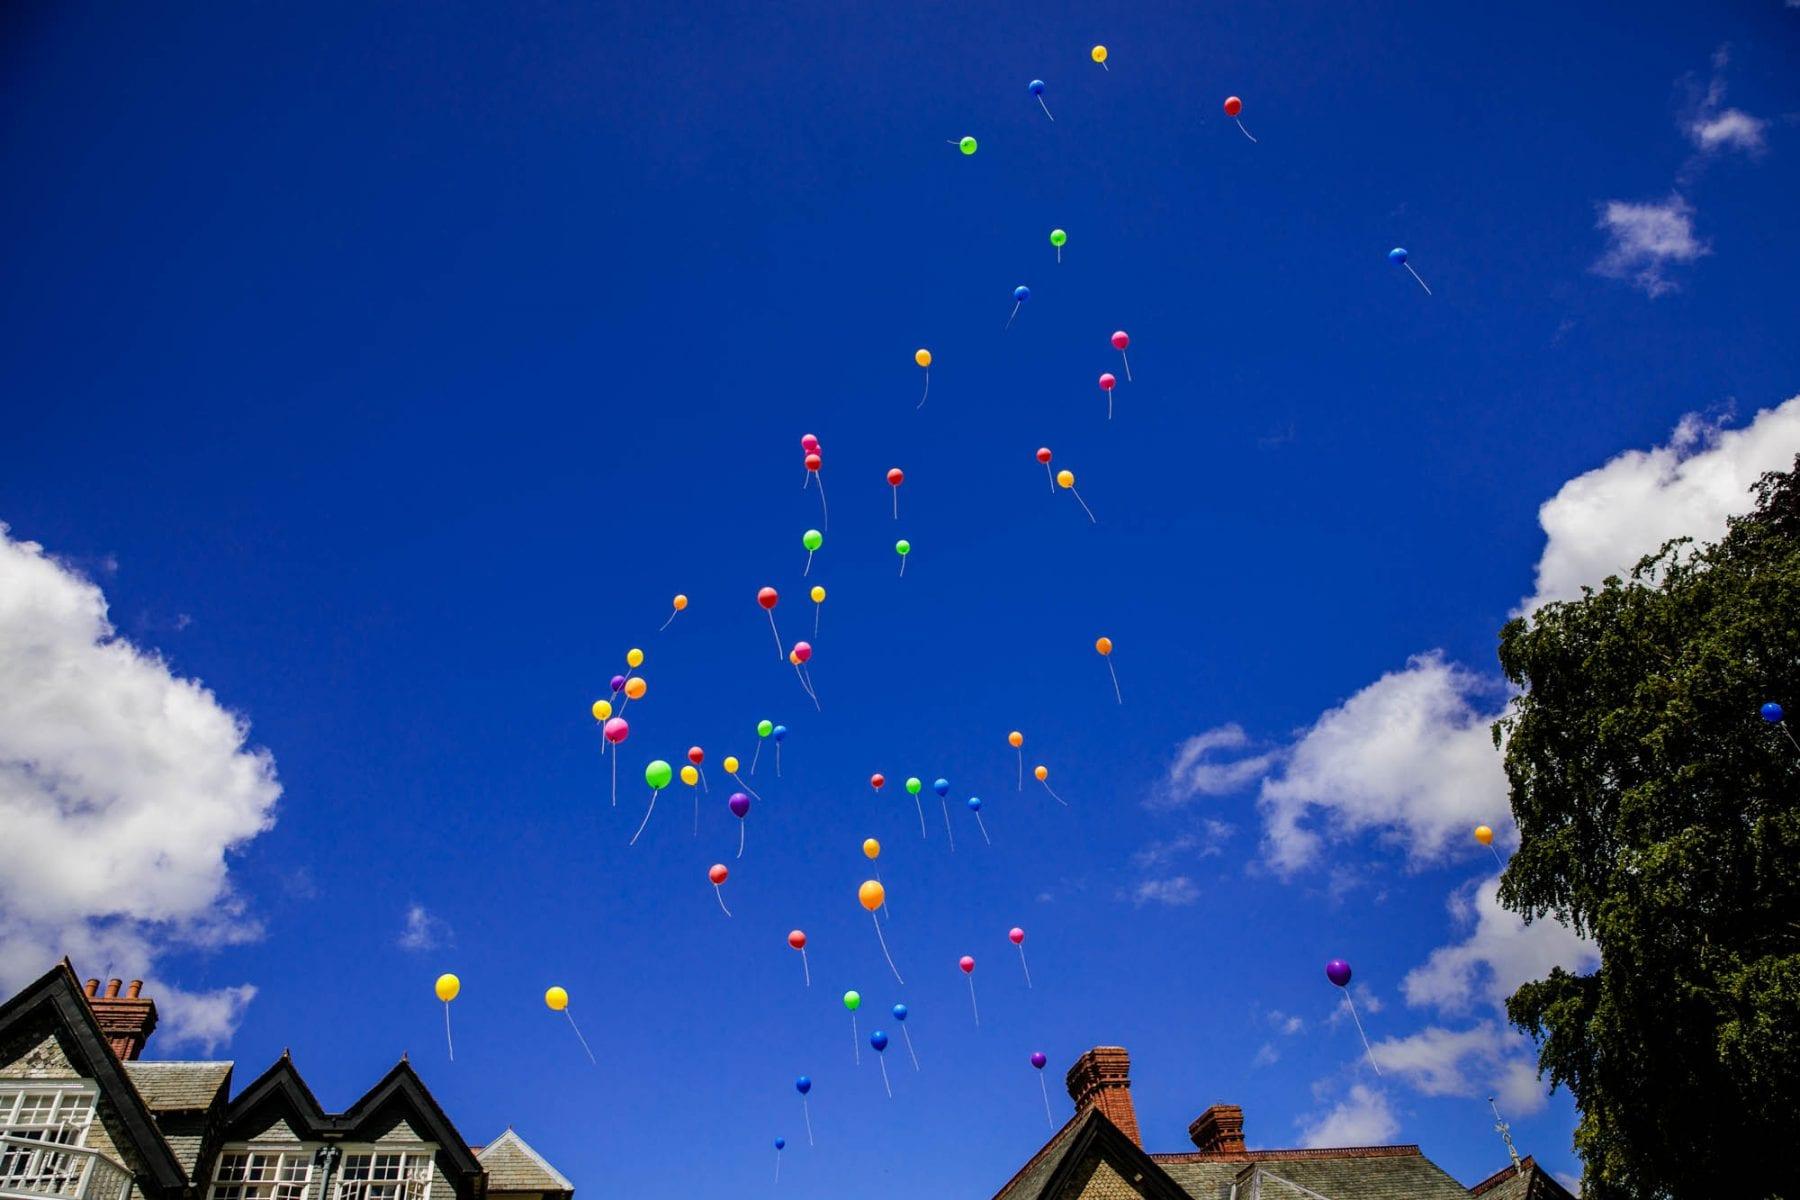 Plas Dinam Balloon Release